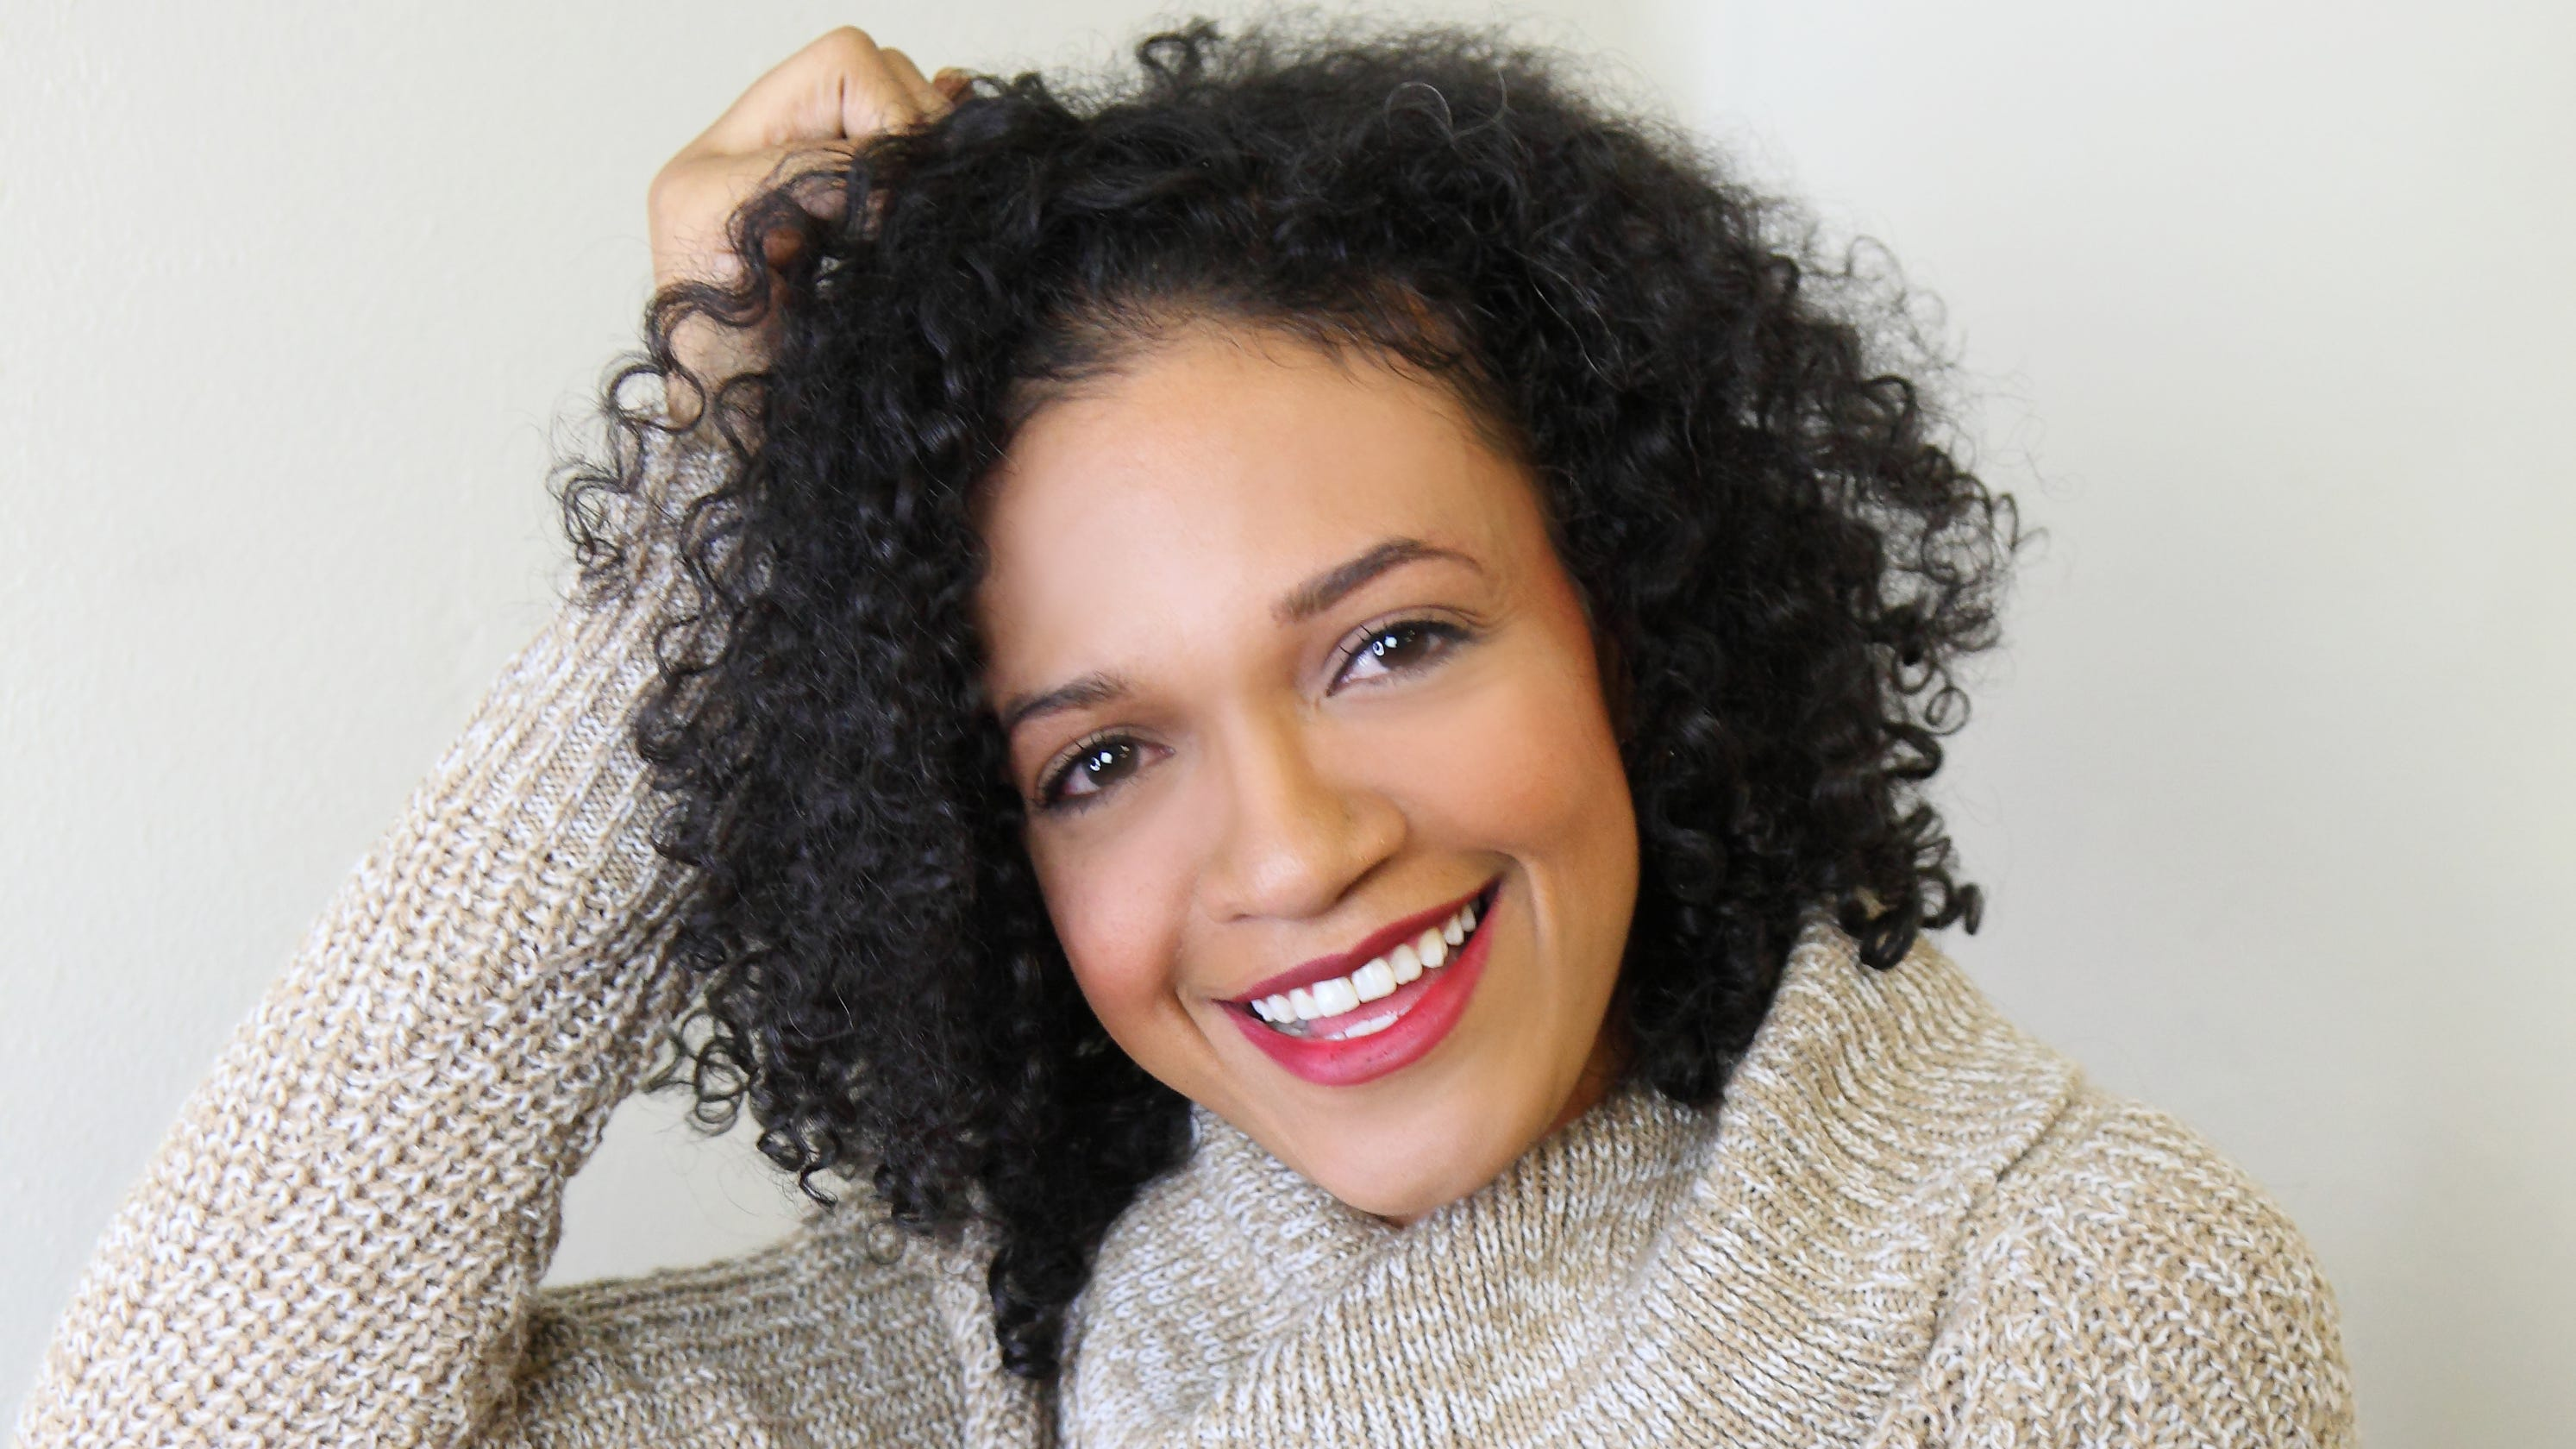 Christmas Everlasting Cast.Louisville Actress Cast In Hallmark S Everlasting Christmas